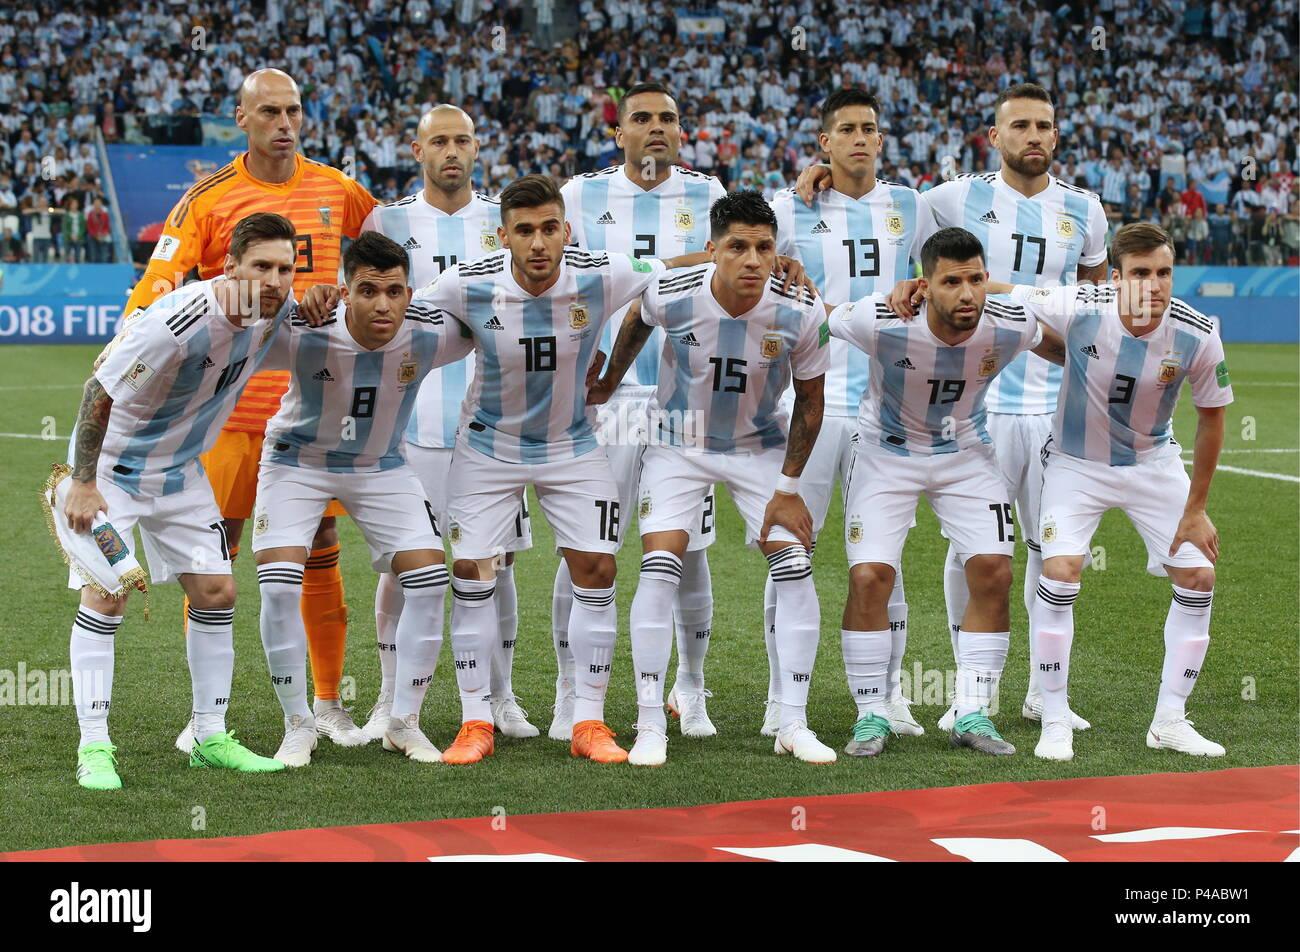 new arrival b1f65 283a1 Argentina National Football Team Stock Photos & Argentina ...